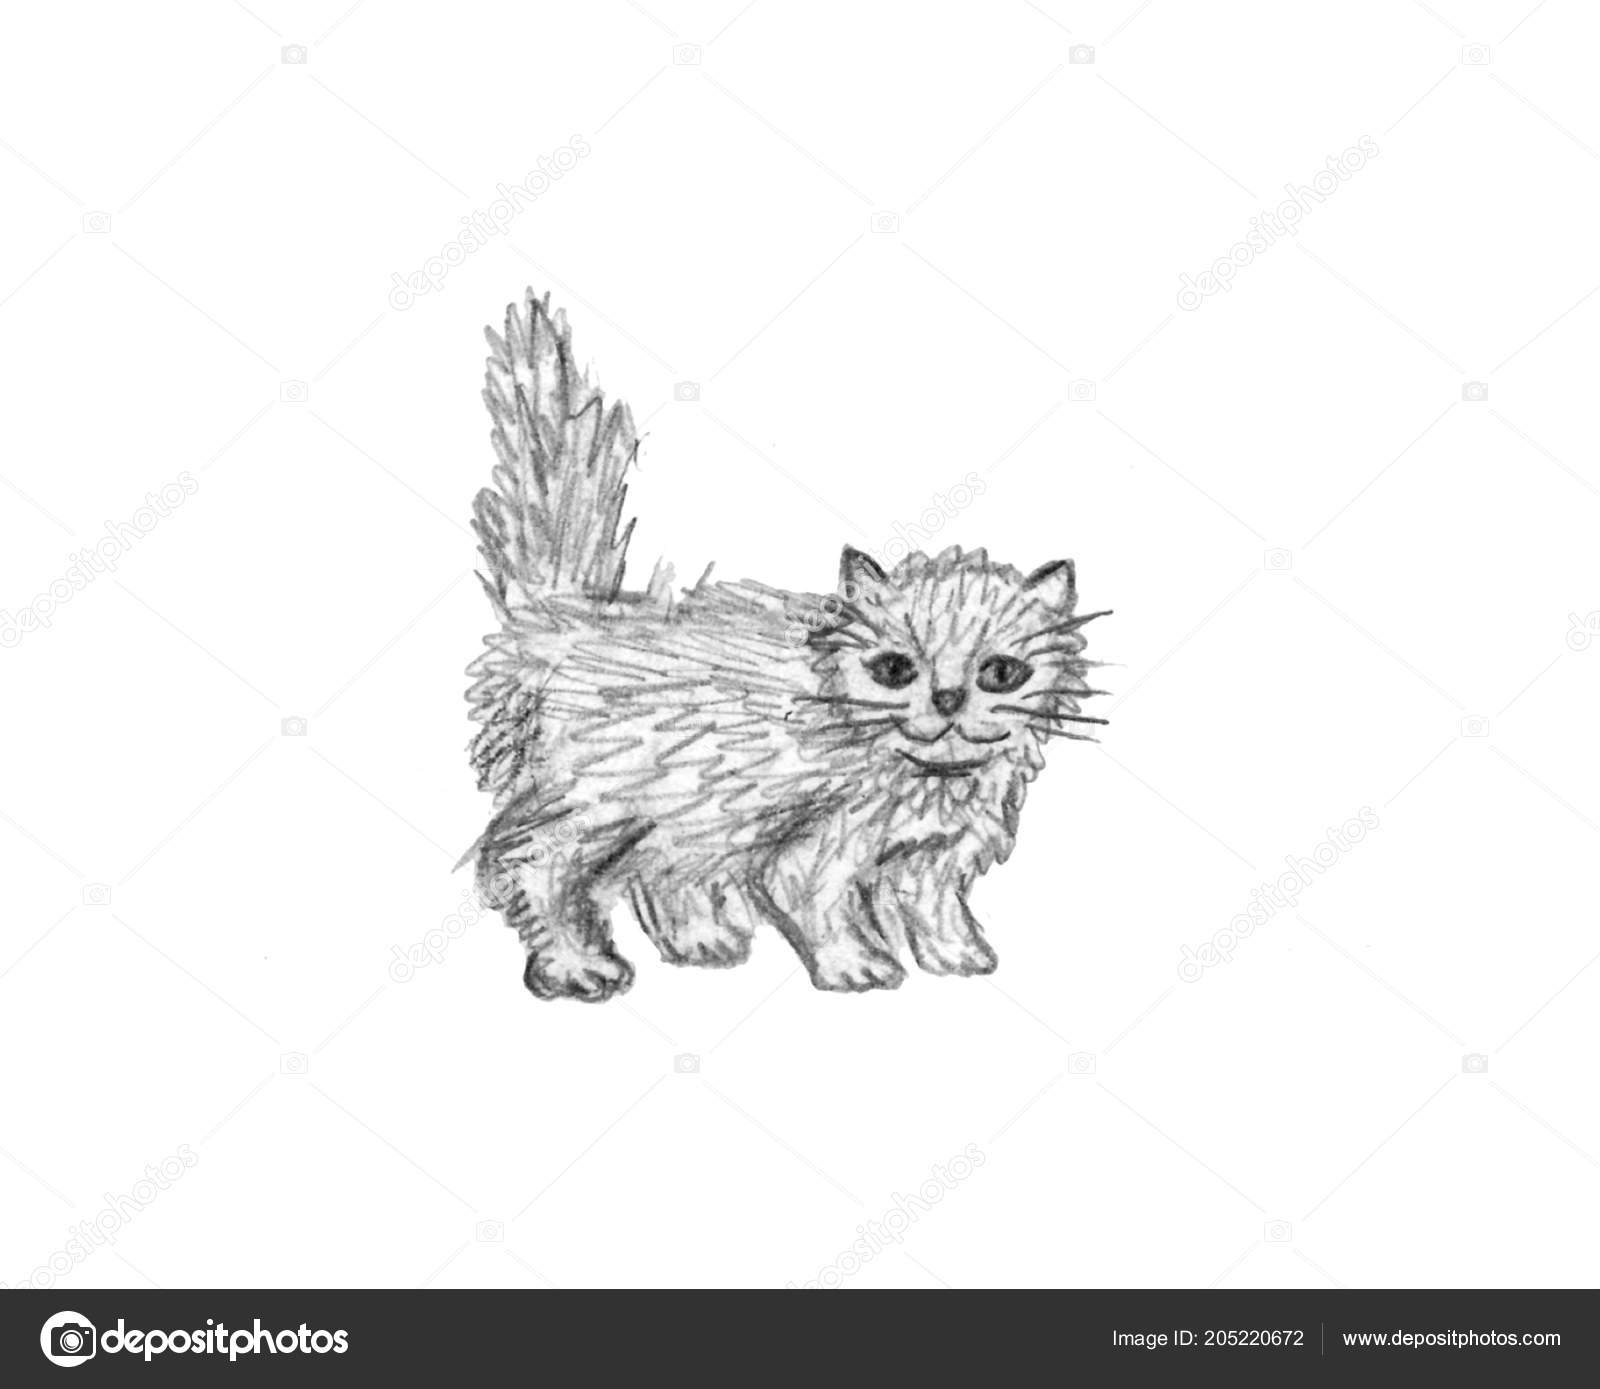 Rucne Kreslene Ilustrace Kocky Izolovane Bilem Pozadi Male Chlupate